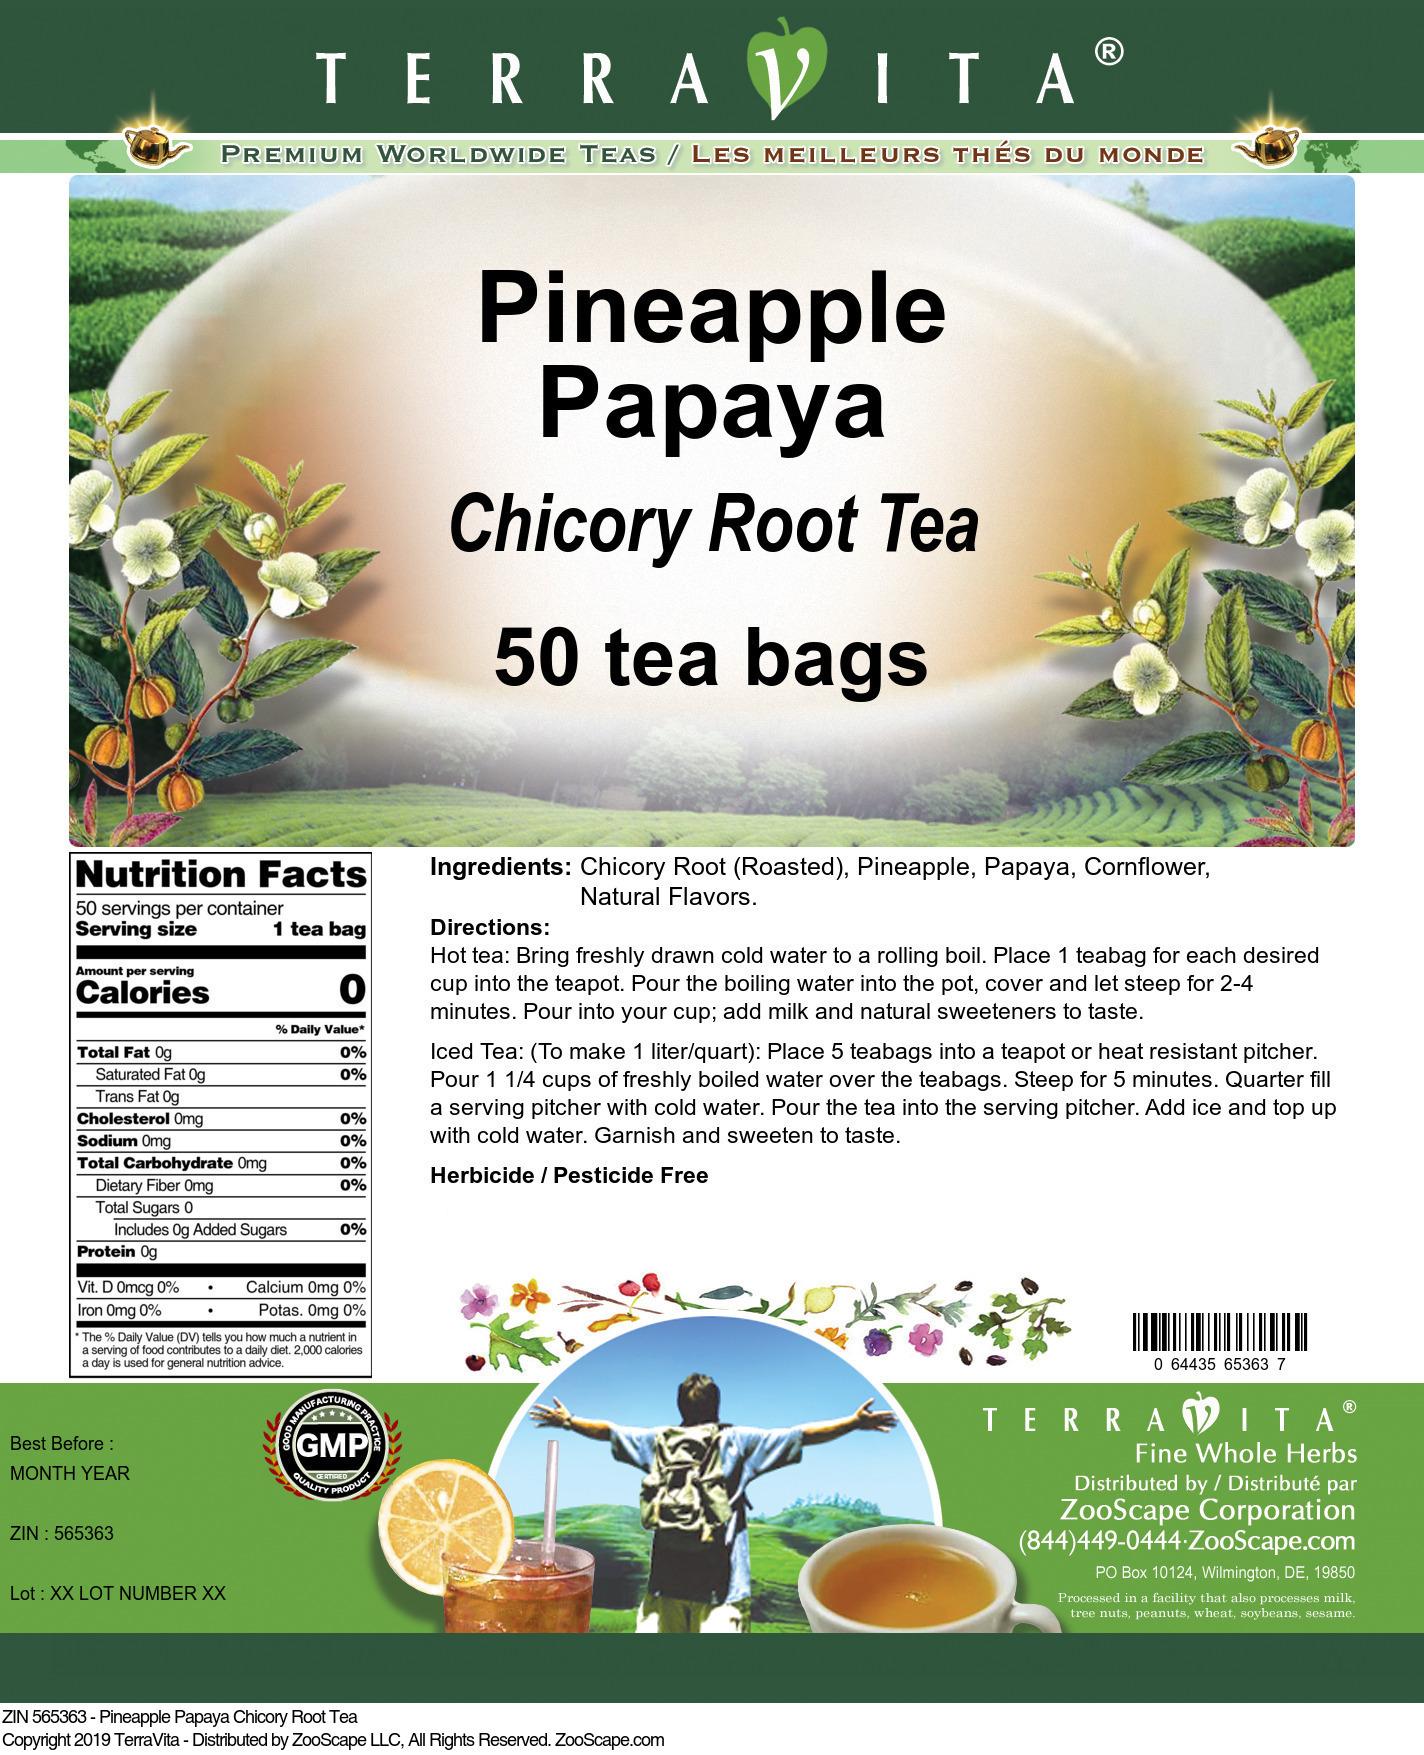 Pineapple Papaya Chicory Root Tea